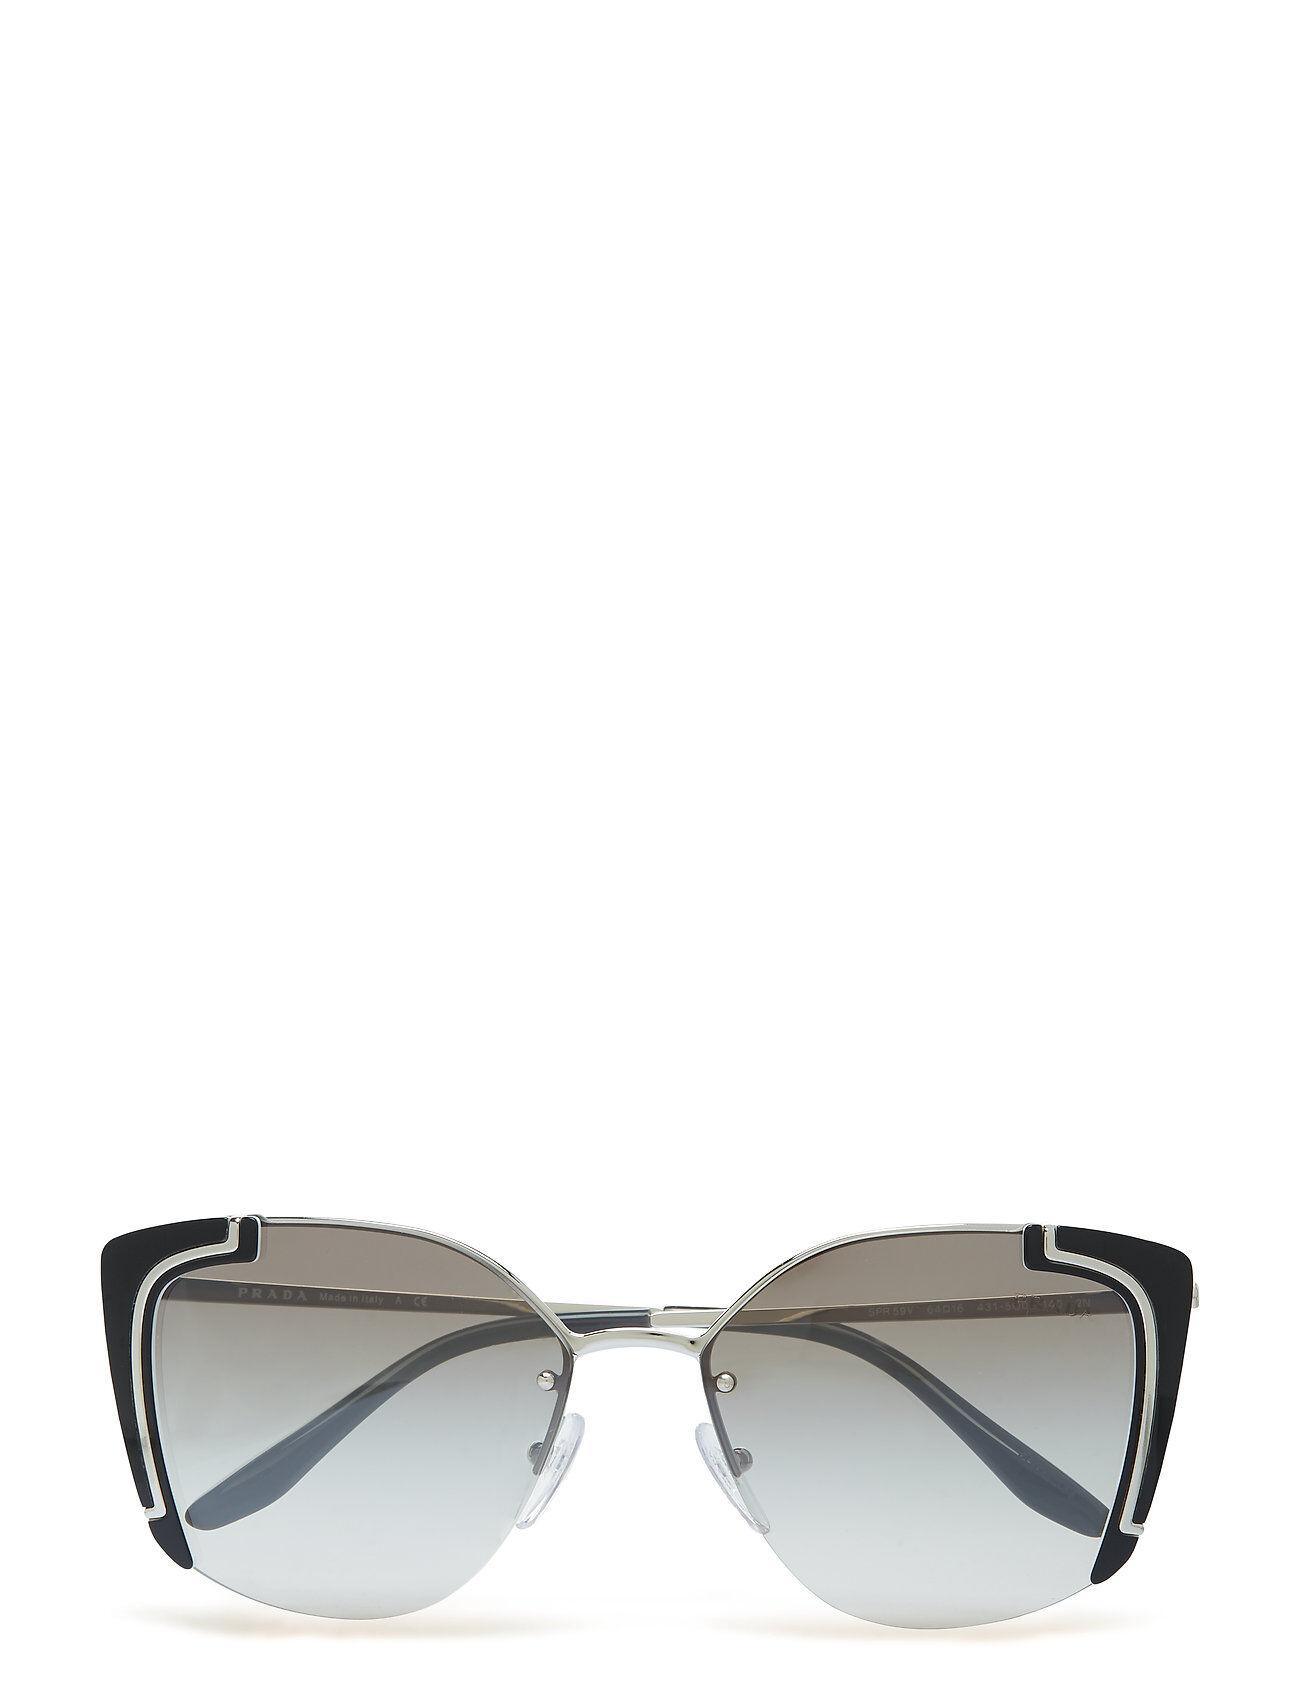 Image of Prada Sunglasses 0pr 59vs Aurinkolasit Sininen Prada Sunglasses